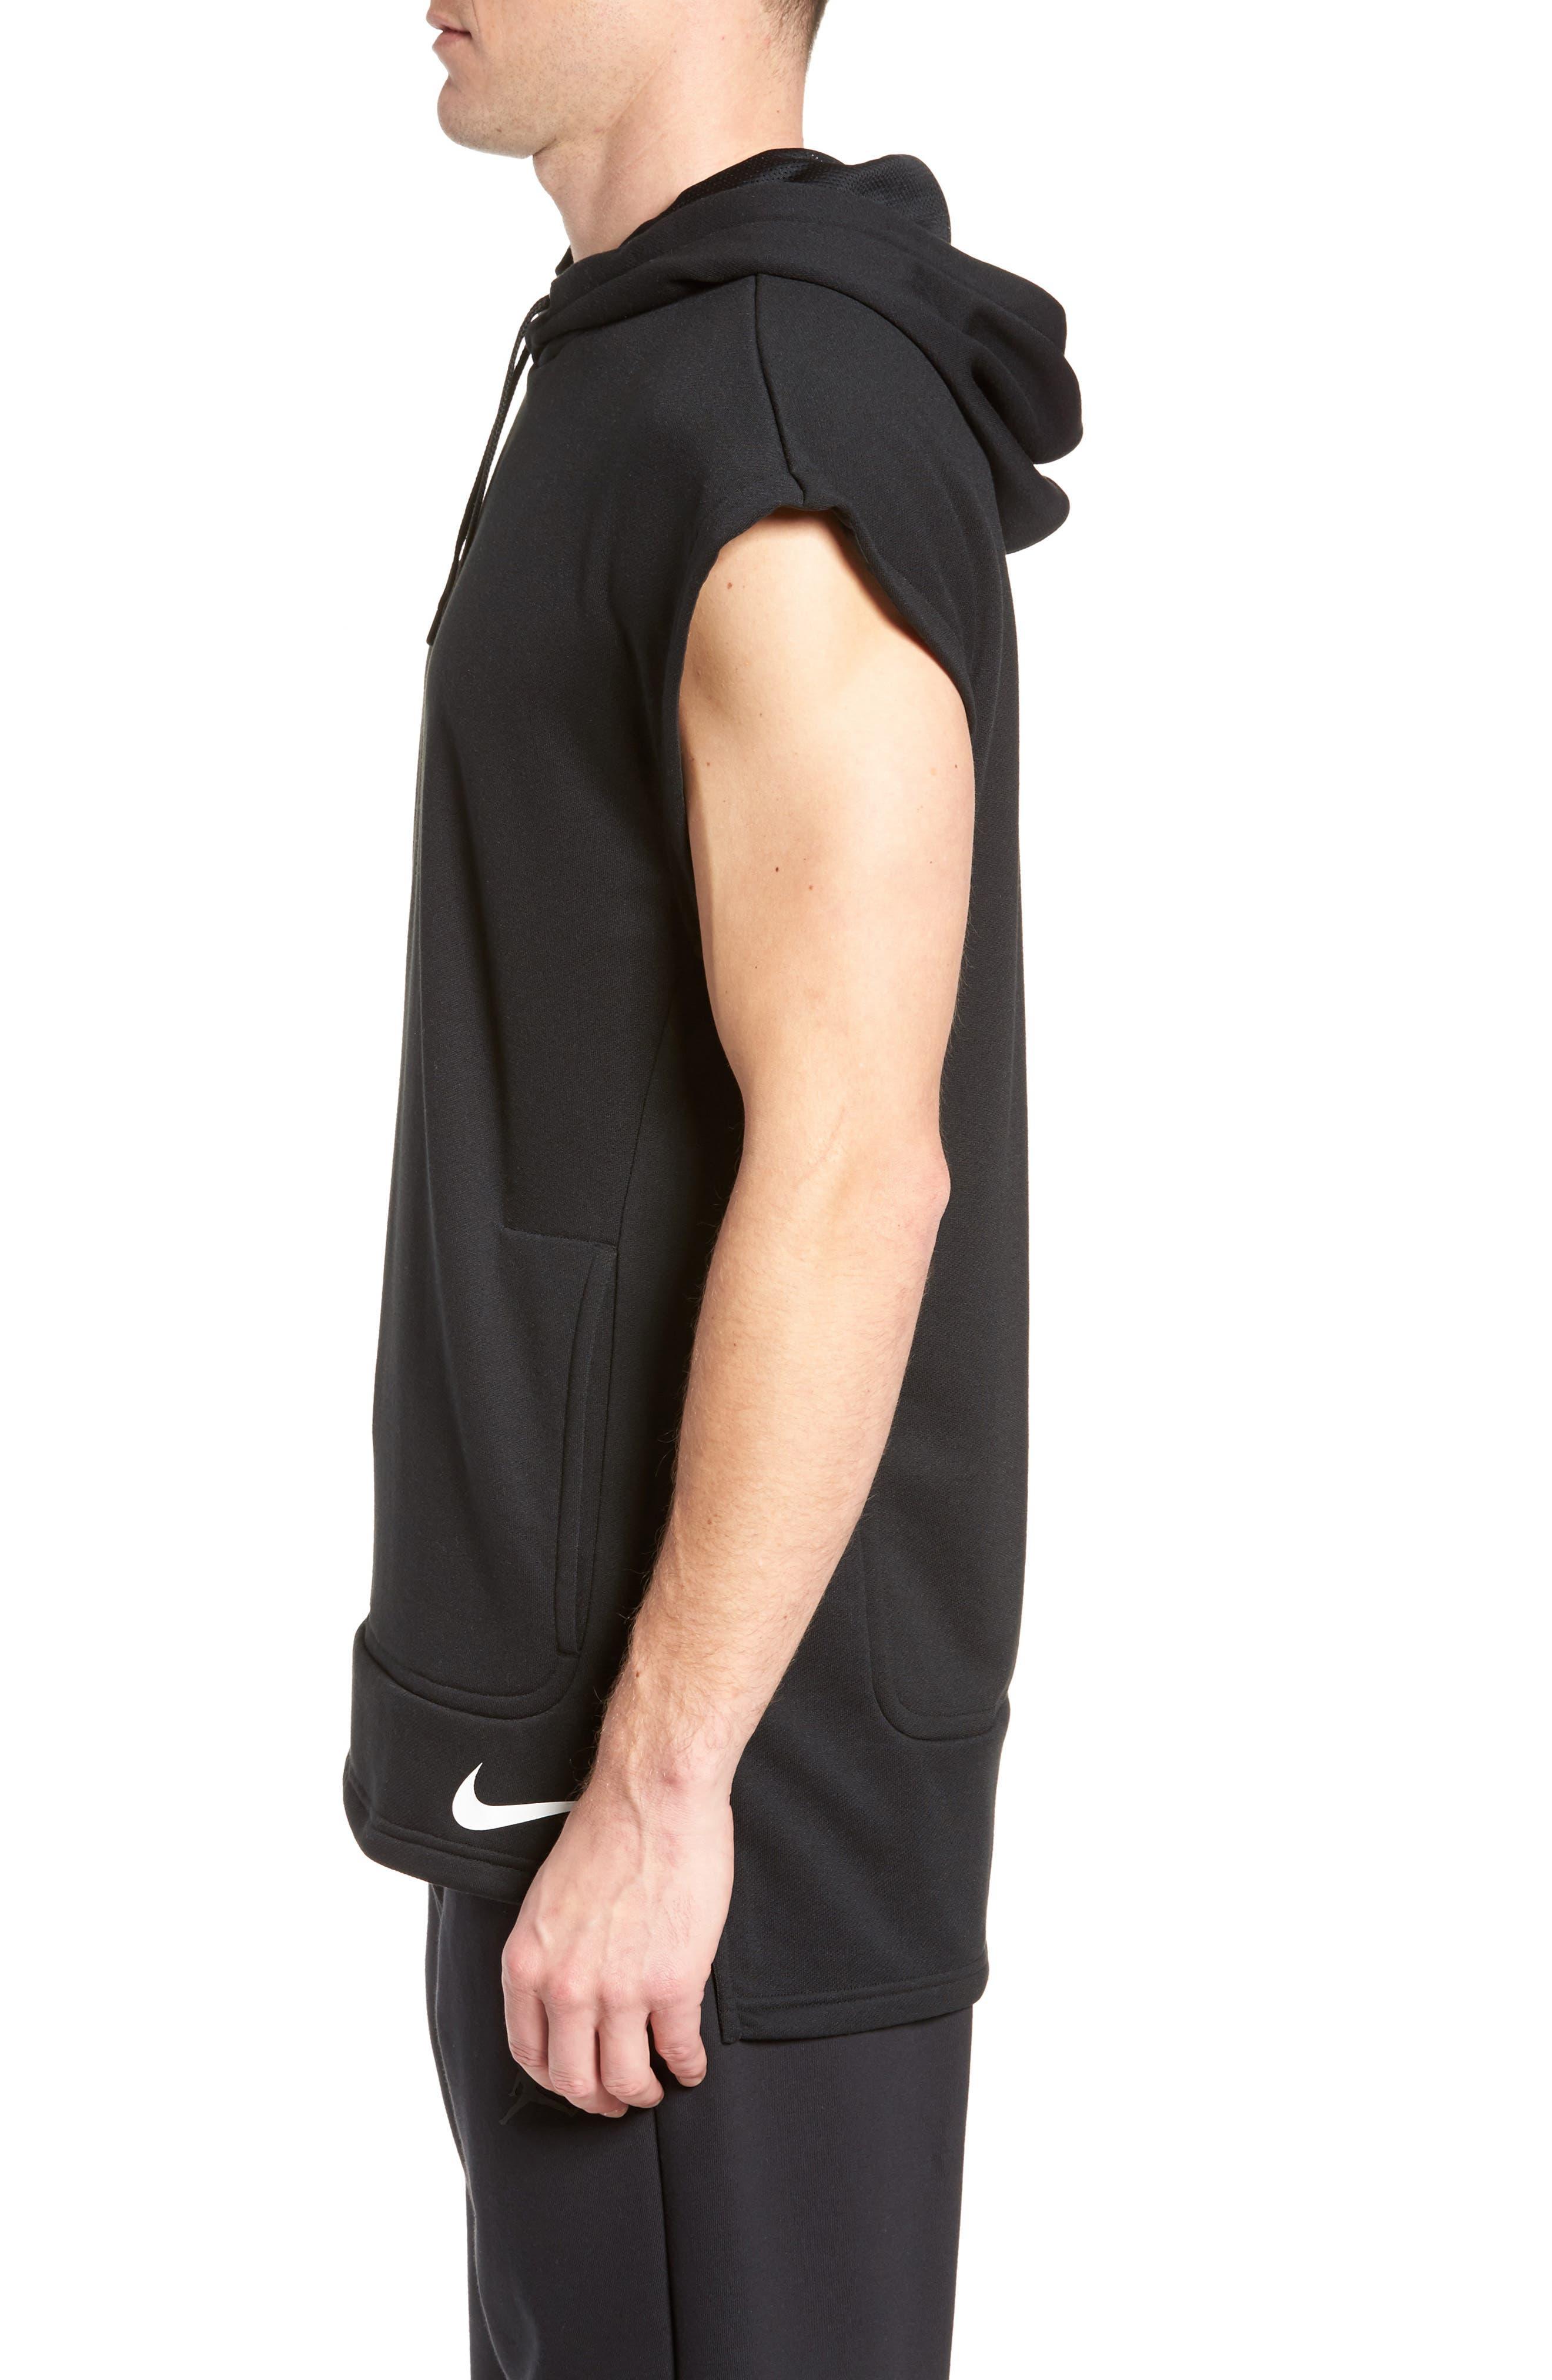 Training Dry Top PX Sleeveless Hoodie,                             Alternate thumbnail 3, color,                             Black/ Black/ White